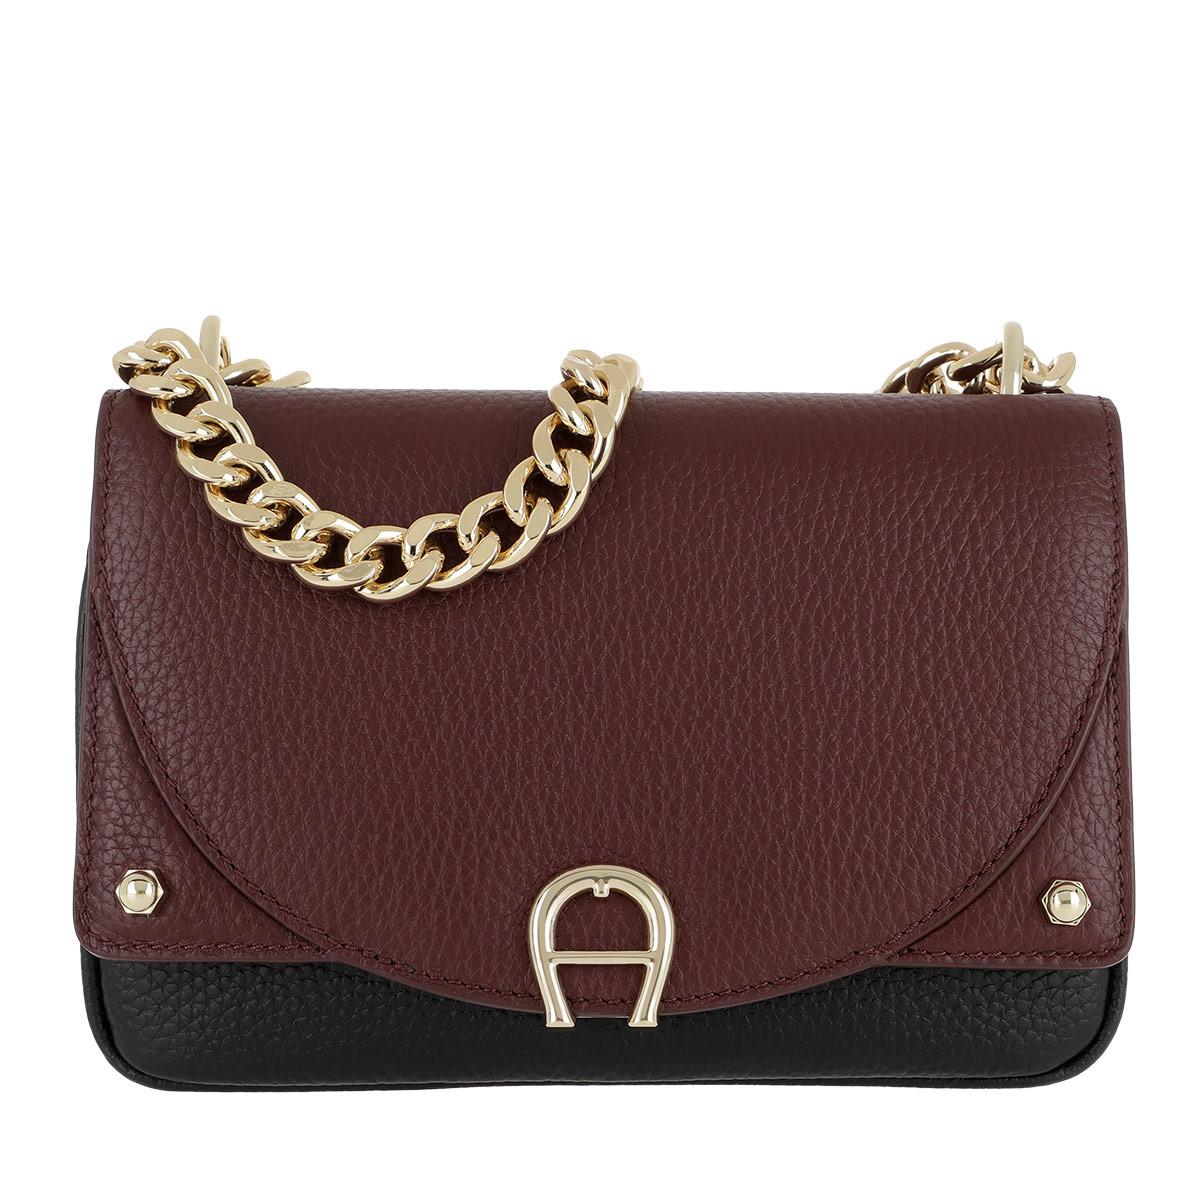 Aigner Umhängetasche - Diadora Crossbody Bag Extra Small Burgundy - in lila - für Damen